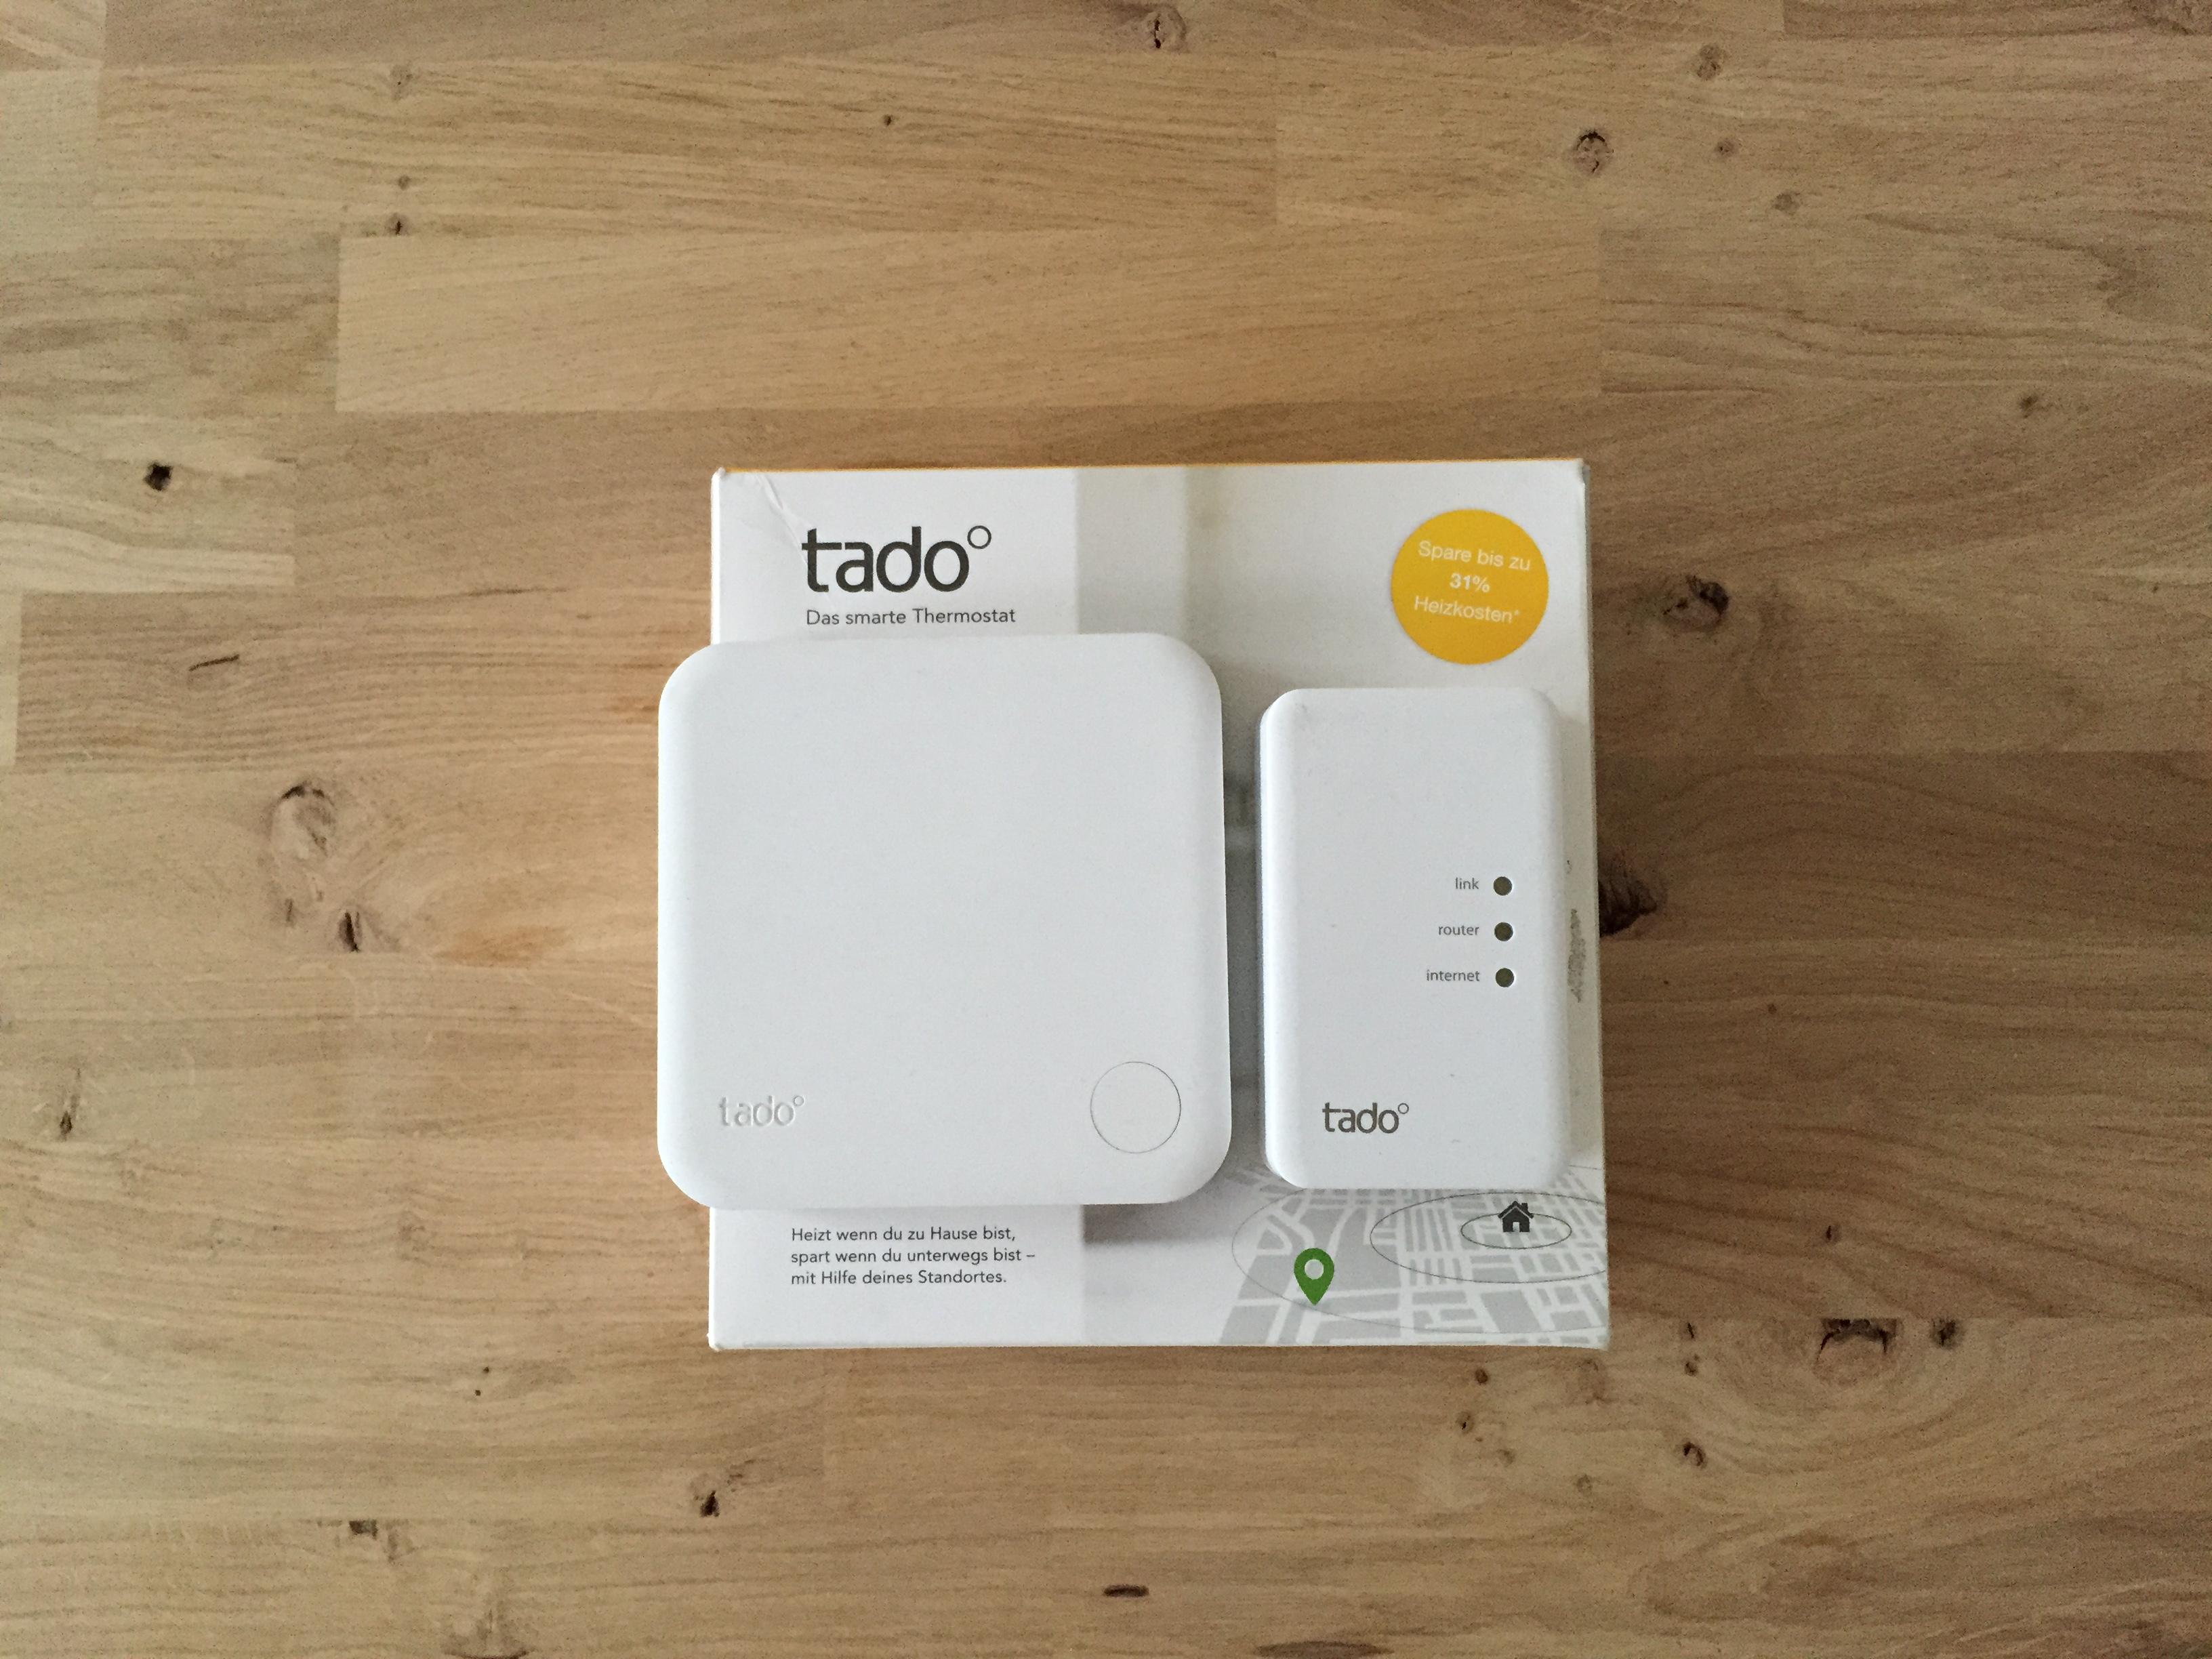 Vergleich: tado° Smart Thermostat & Netatmo Thermostat